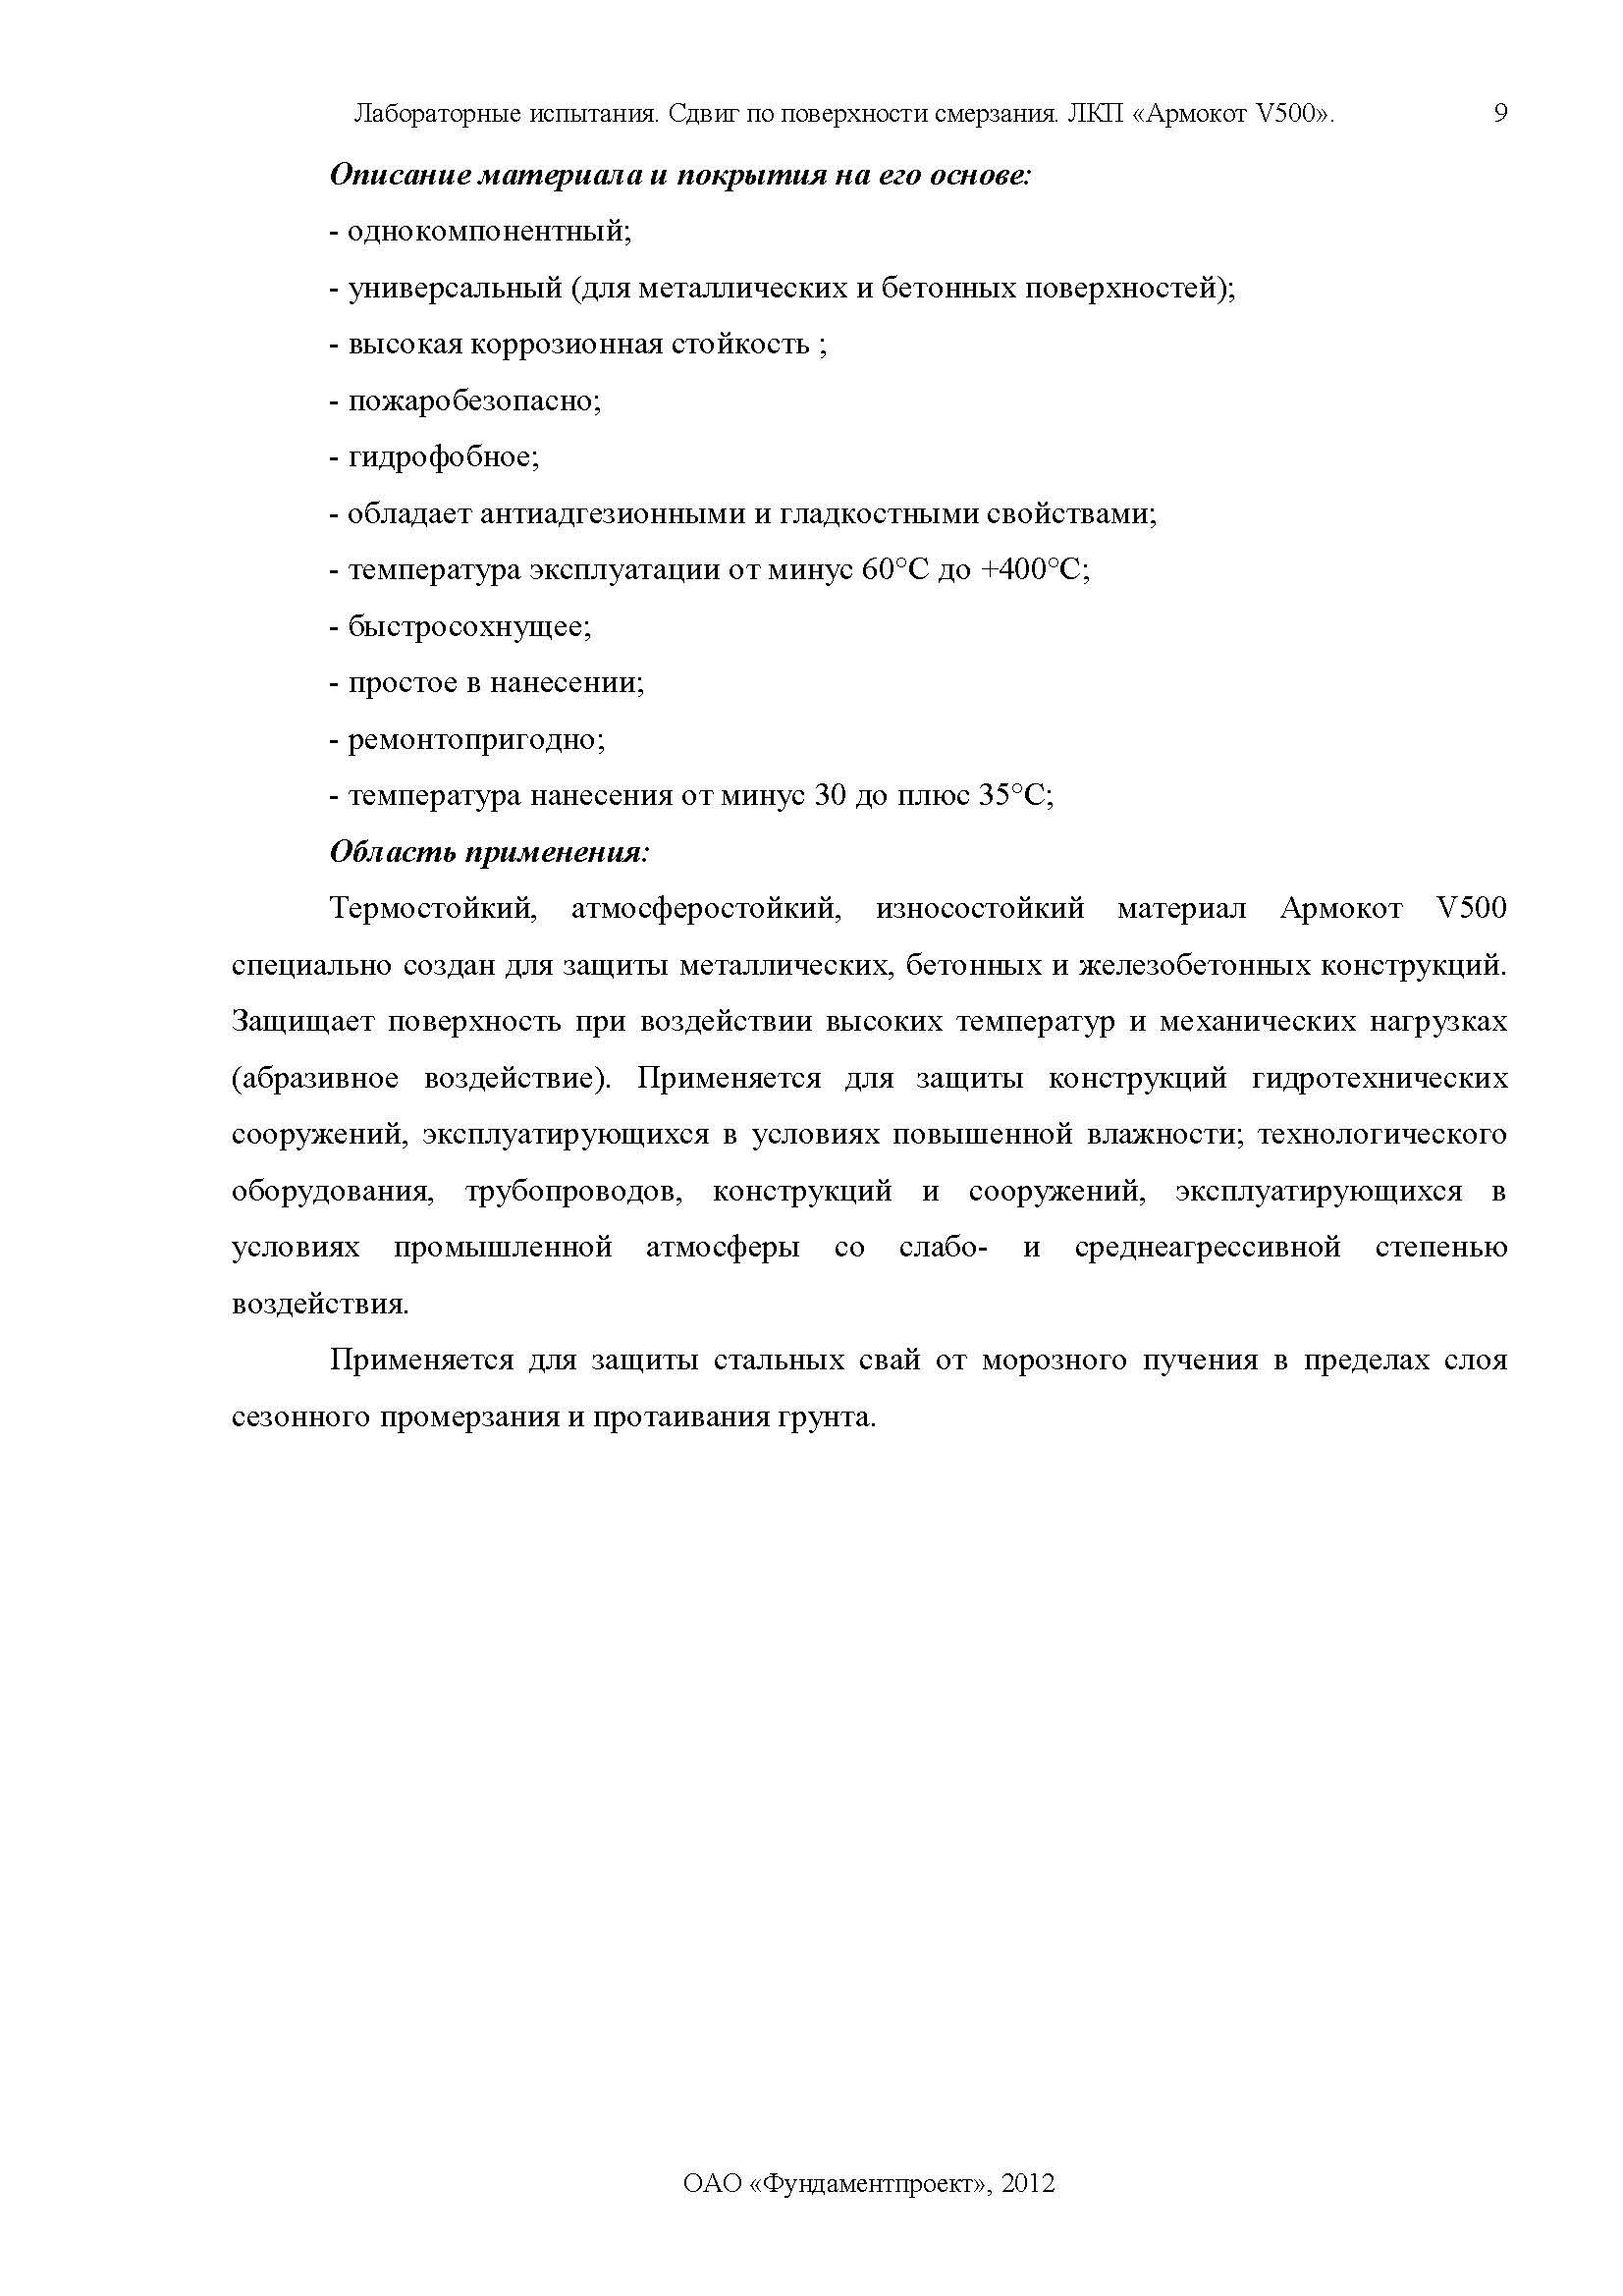 Отчет по сваям Армокот V500 Фундаментпроект_Страница_09